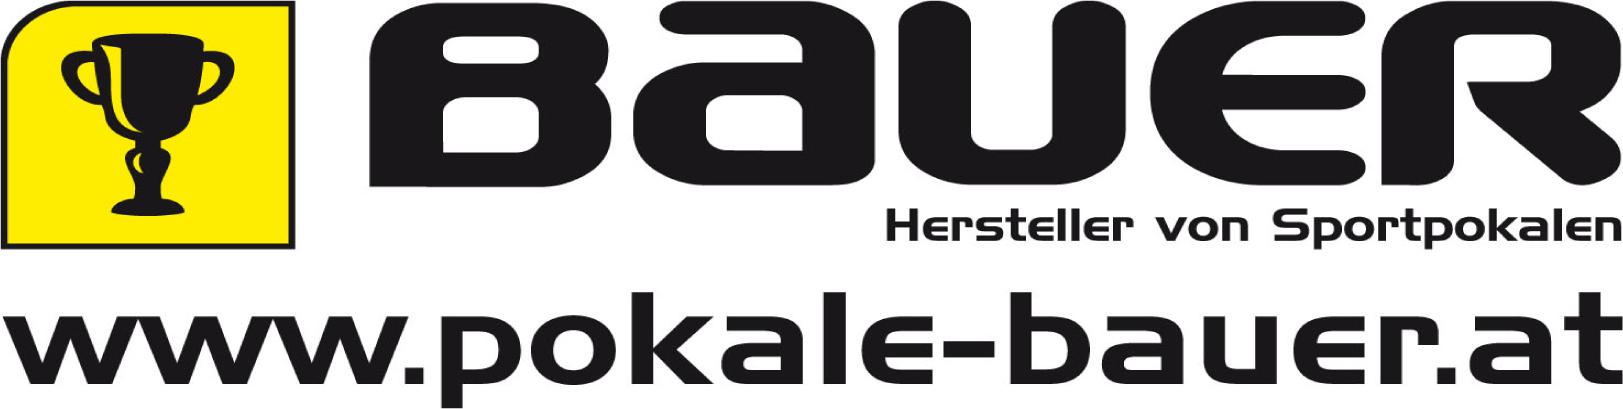 Bauer Pokale Logo